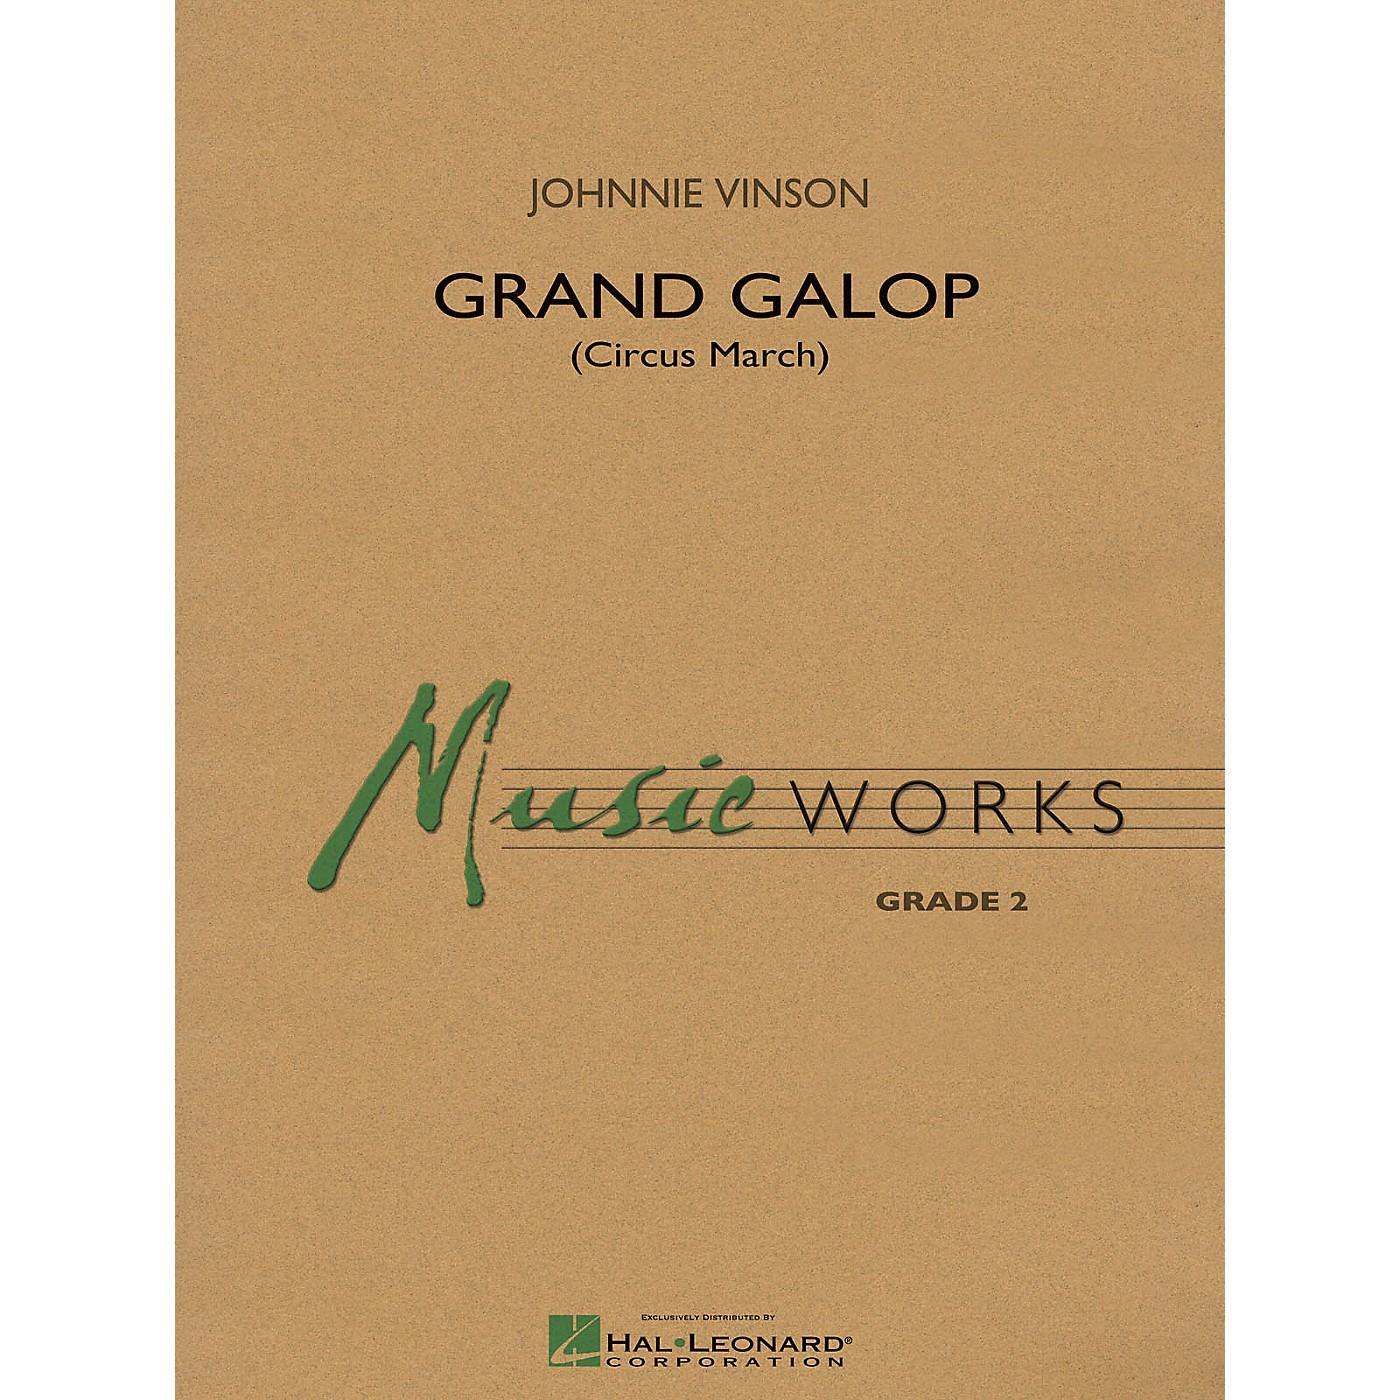 Hal Leonard Grand Galop (Circus March) - Music Works Series Grade 2 thumbnail